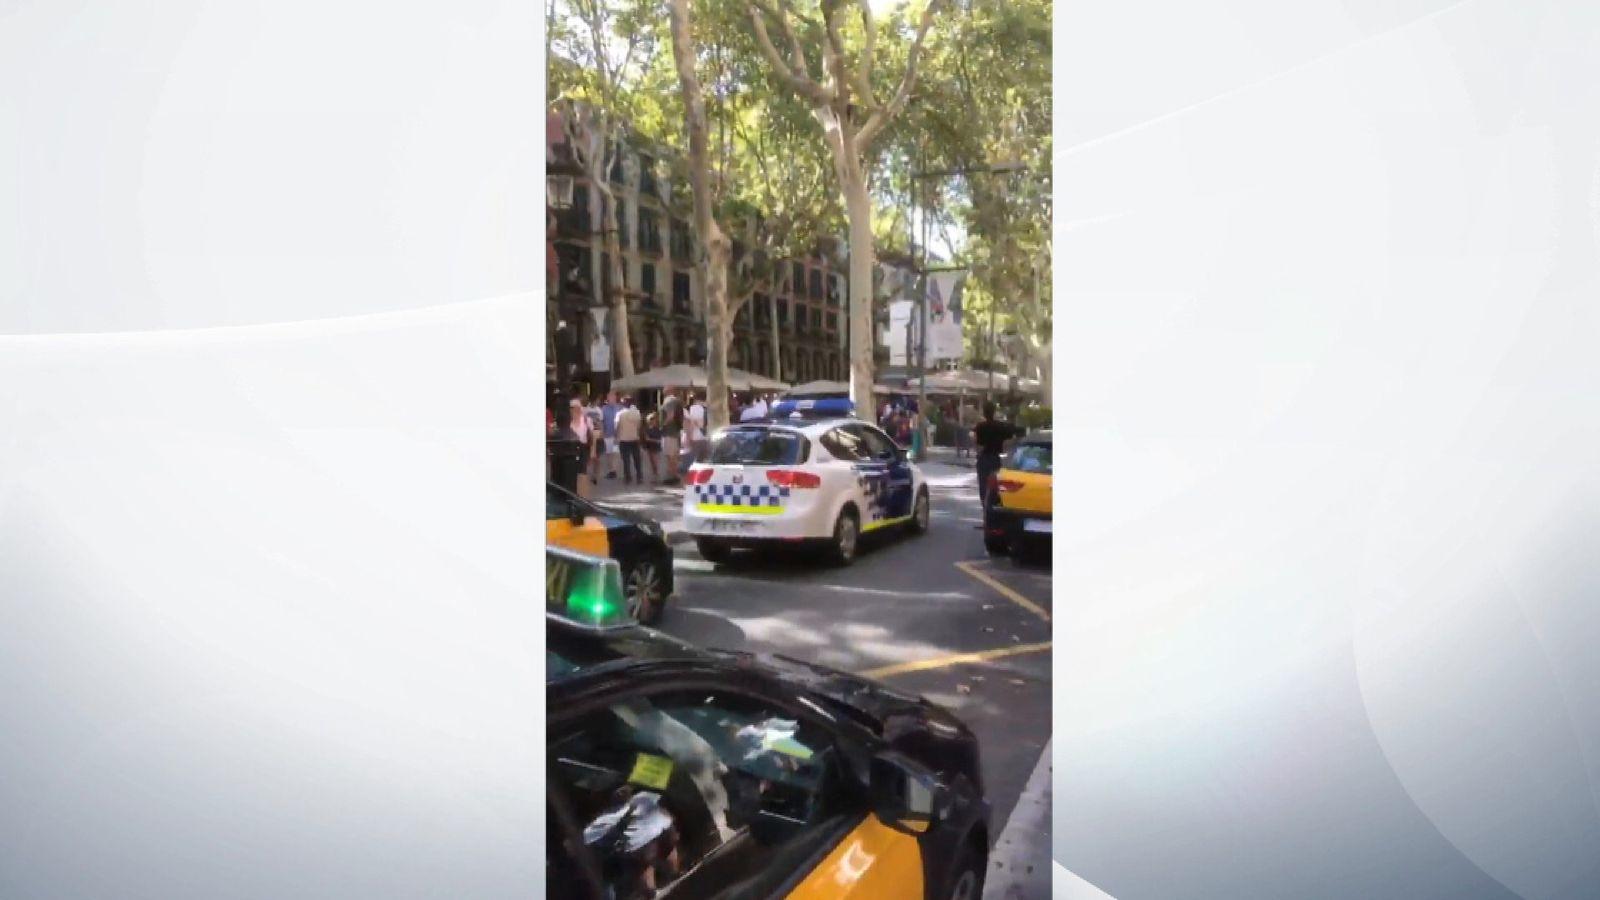 Police respond to terrorist attack in Barcelona